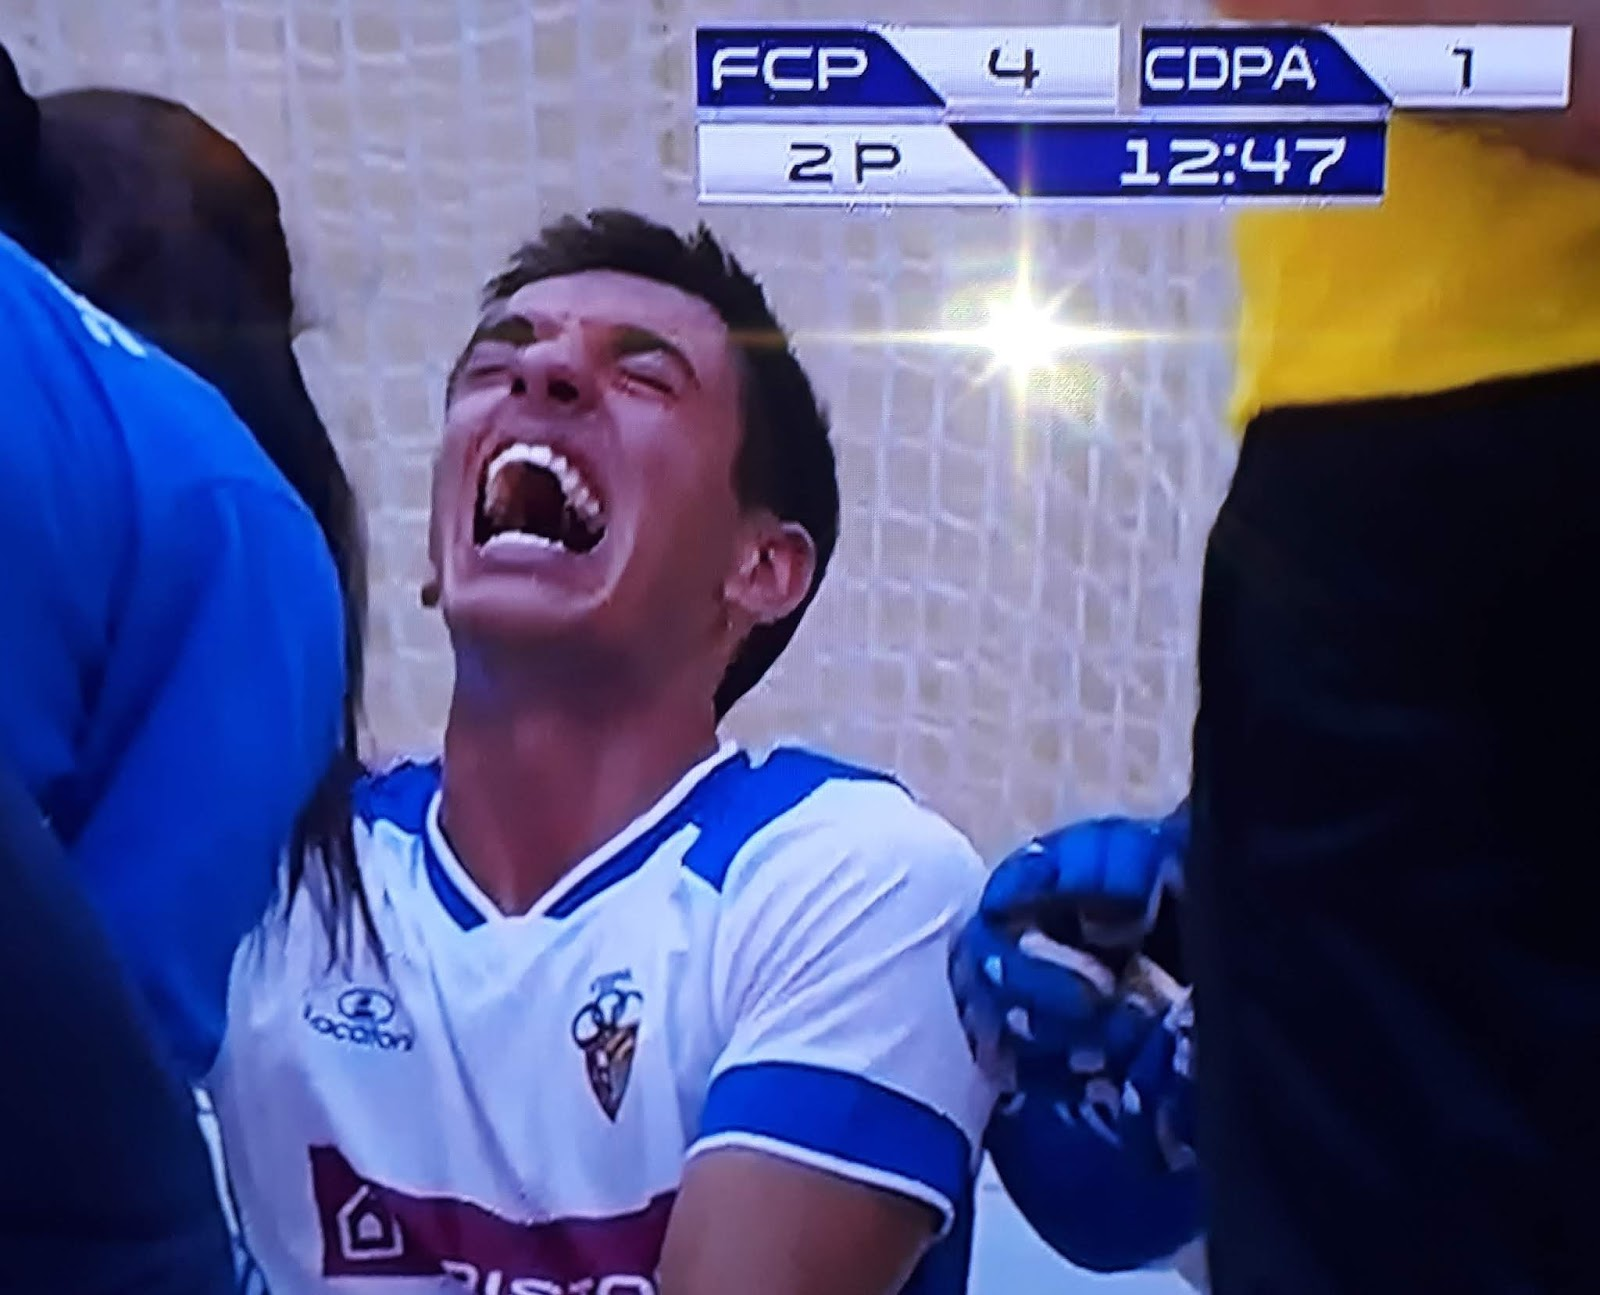 Felipe Fernandes lesiona-se com gravidade